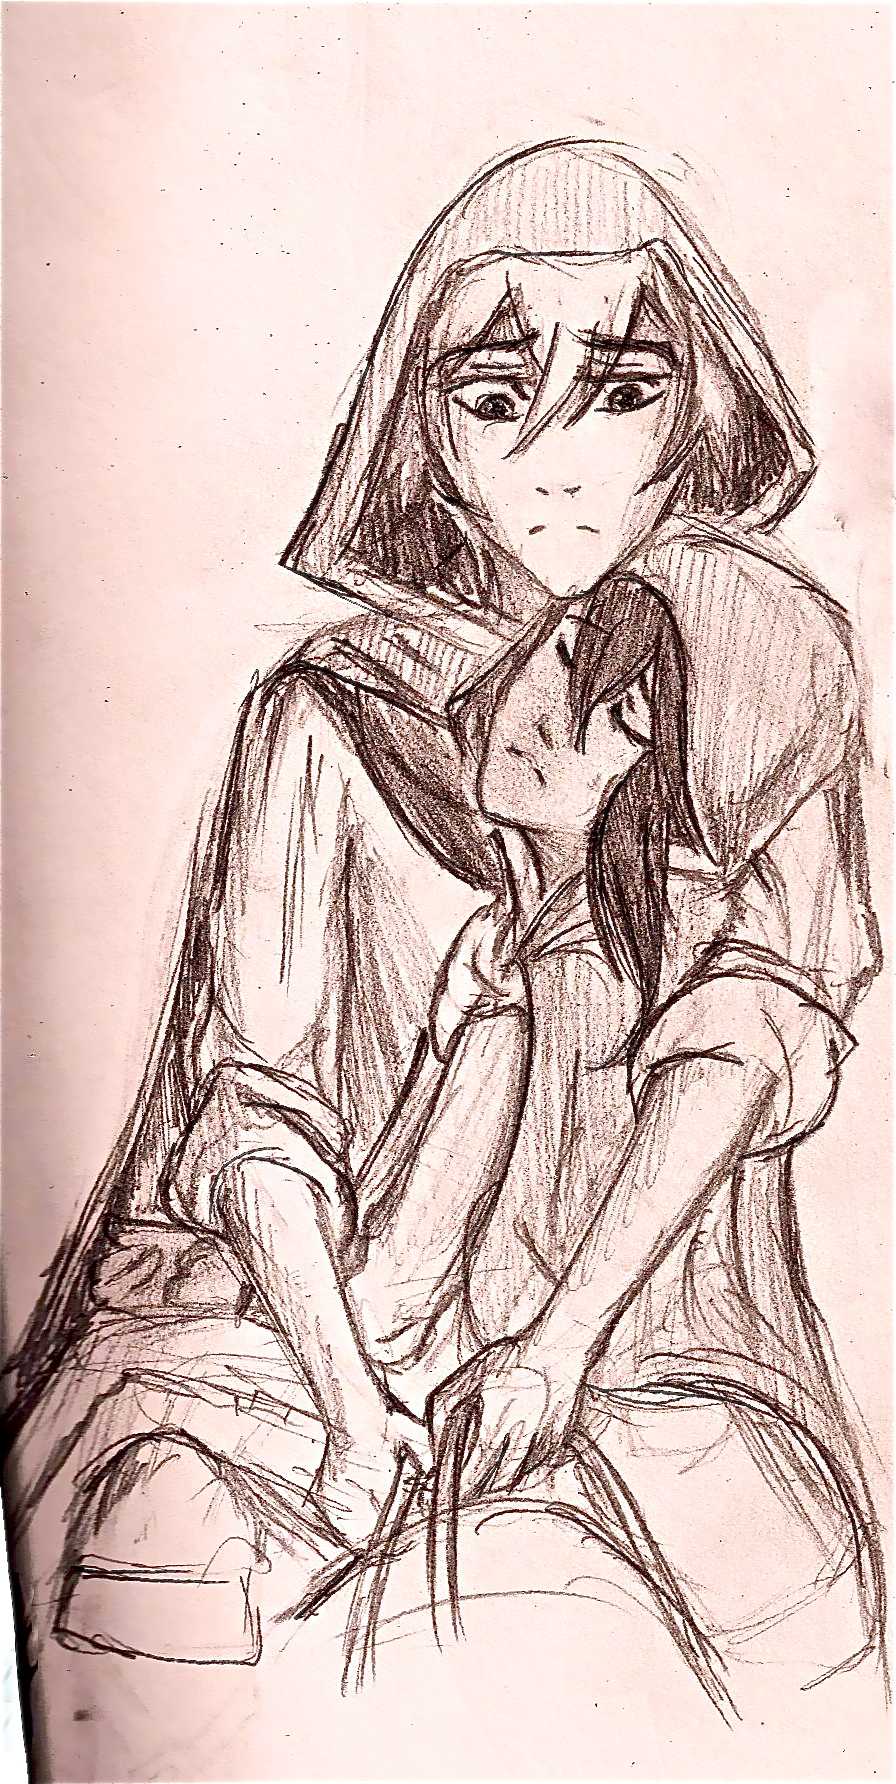 Raisa and Han sketch by bookaholic5